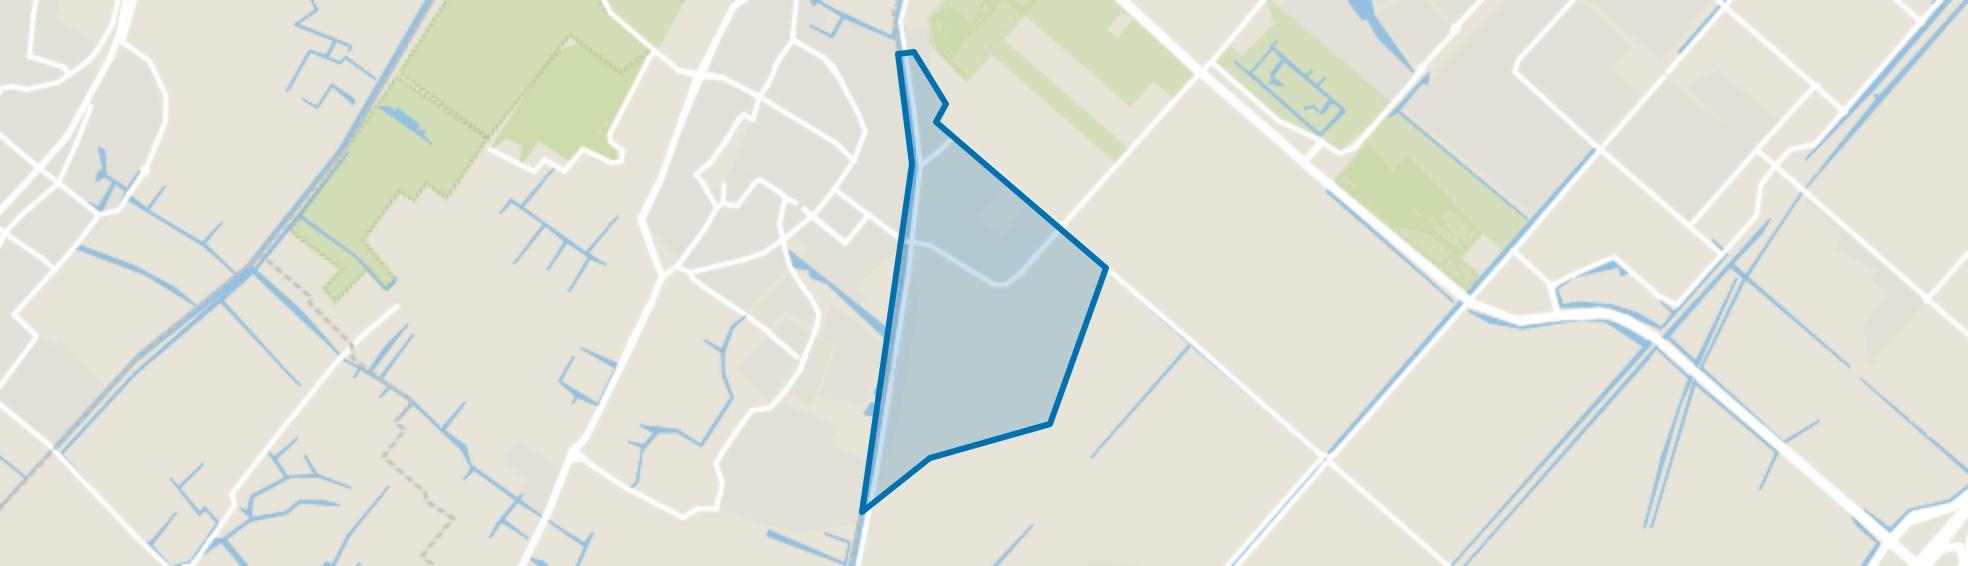 Lisserbroek, Lisserbroek map